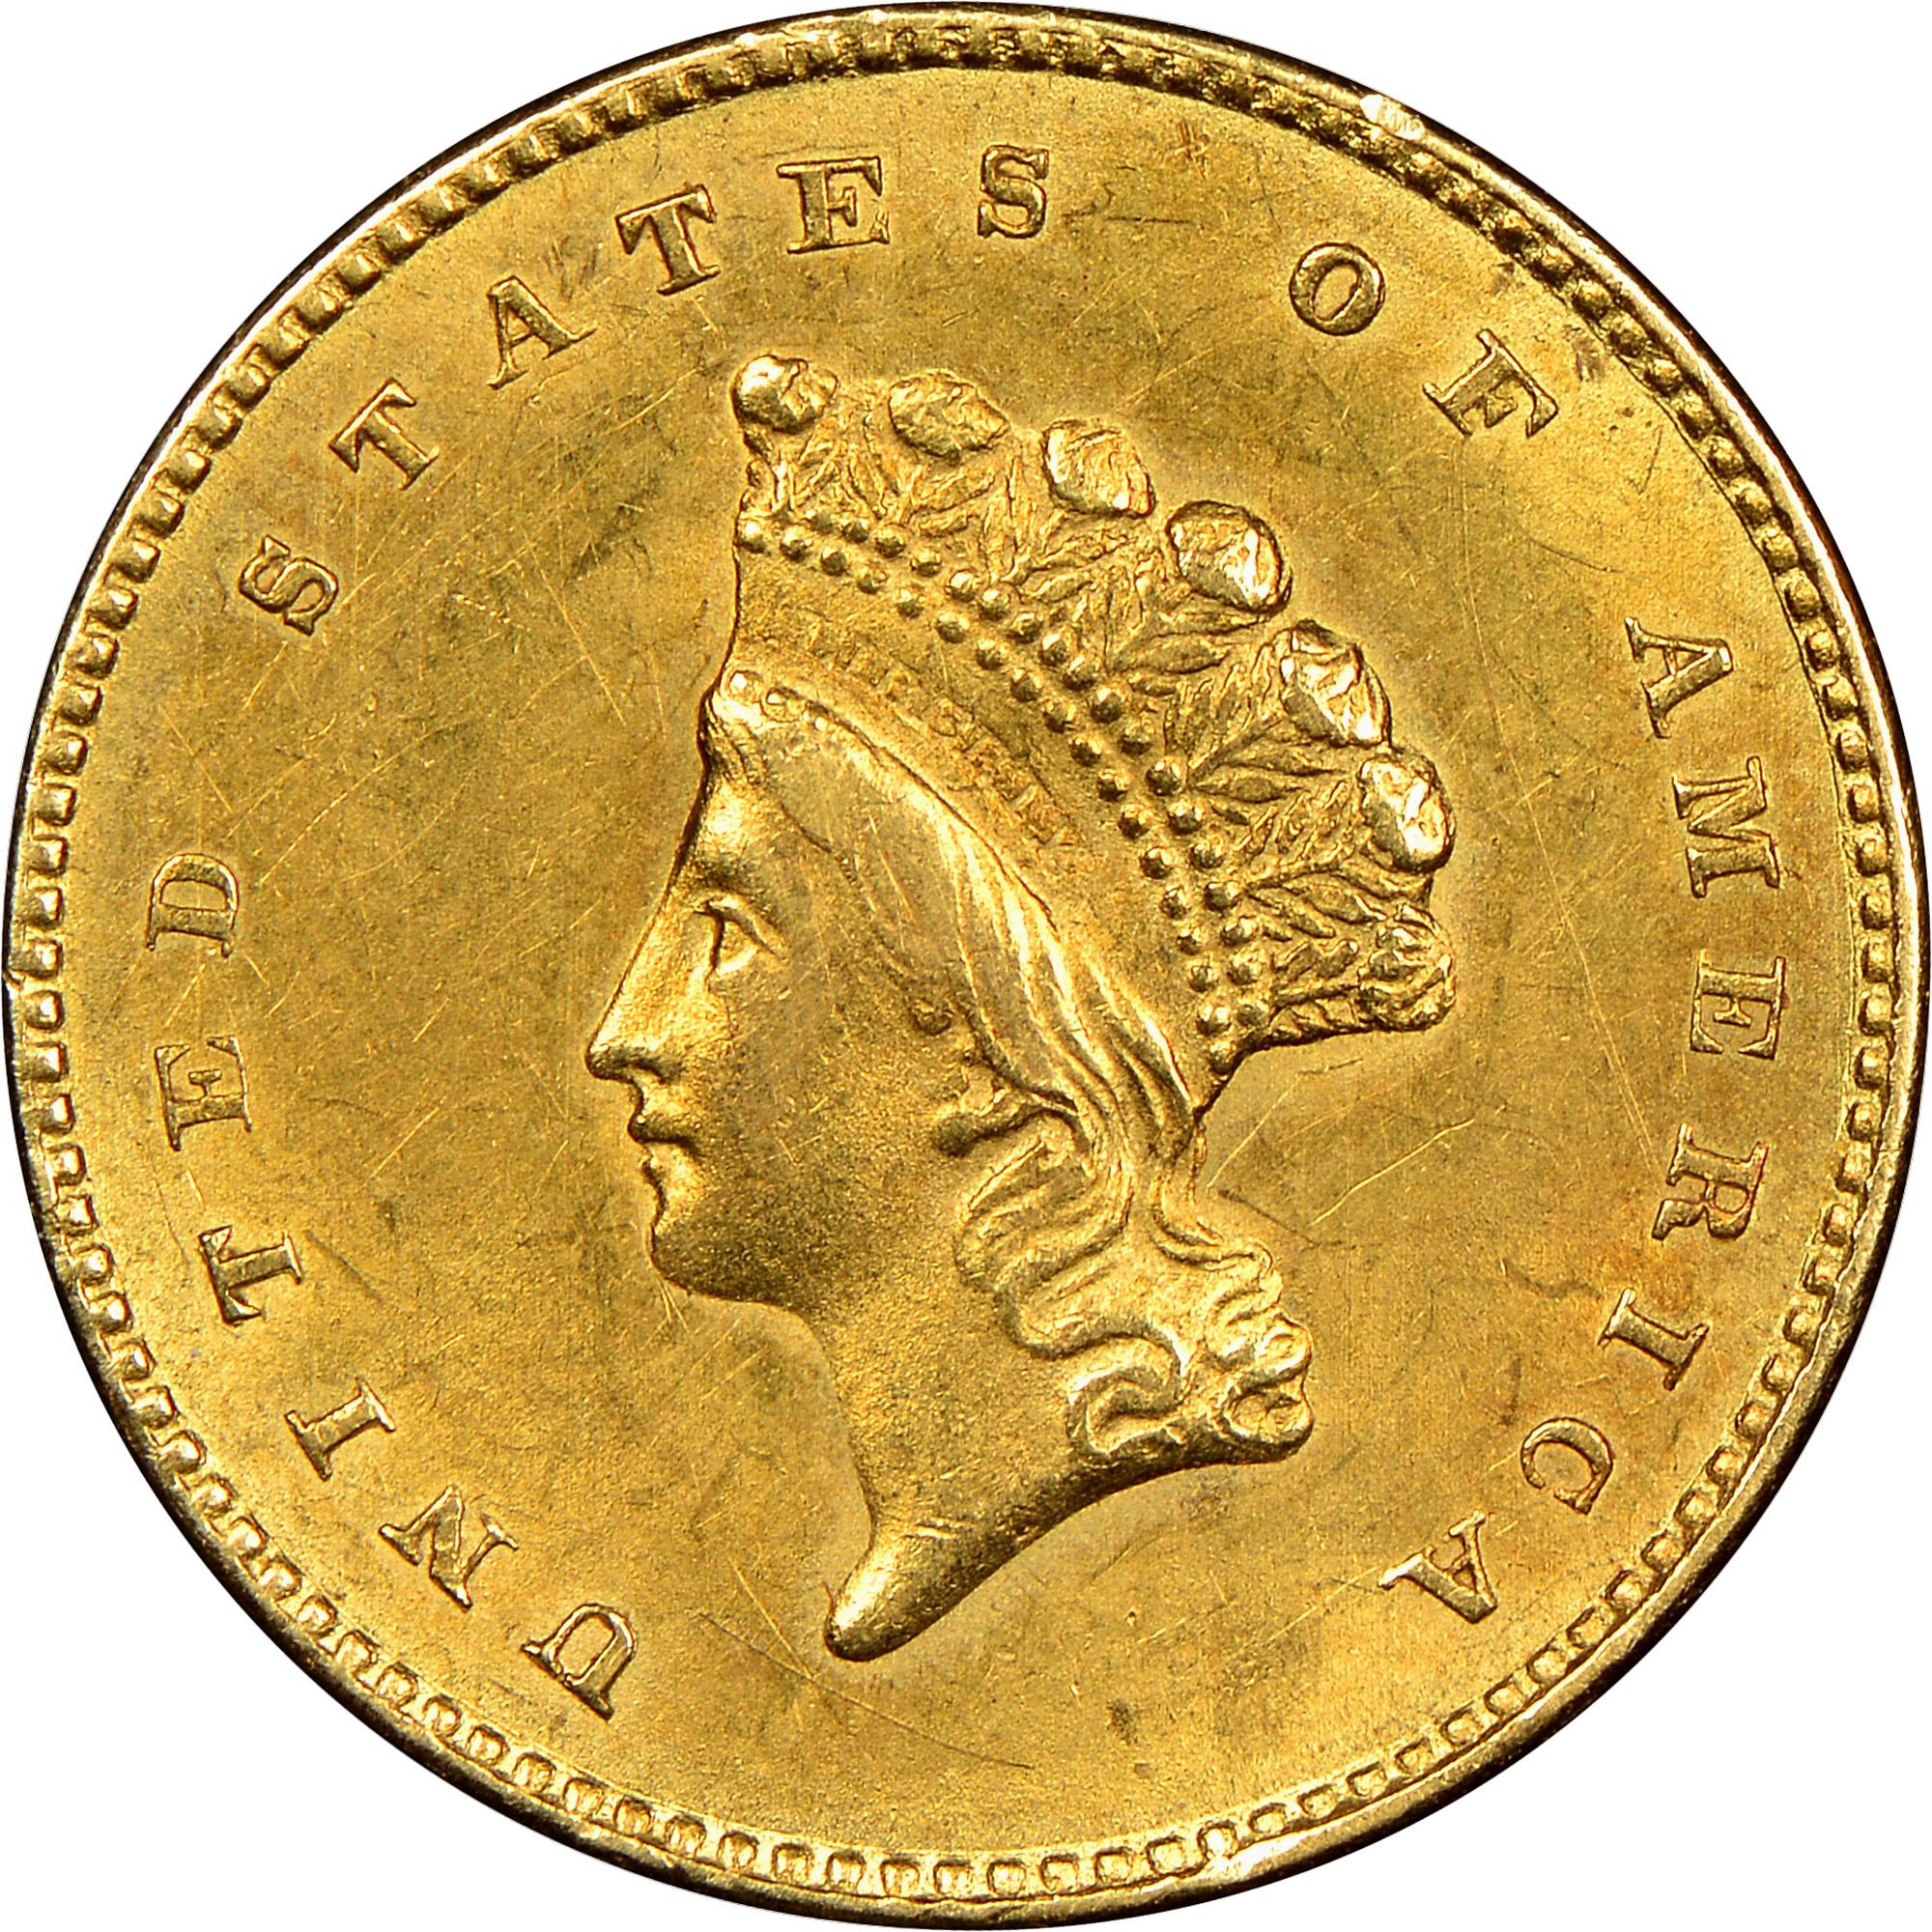 G 1 Ms Gold Dollars